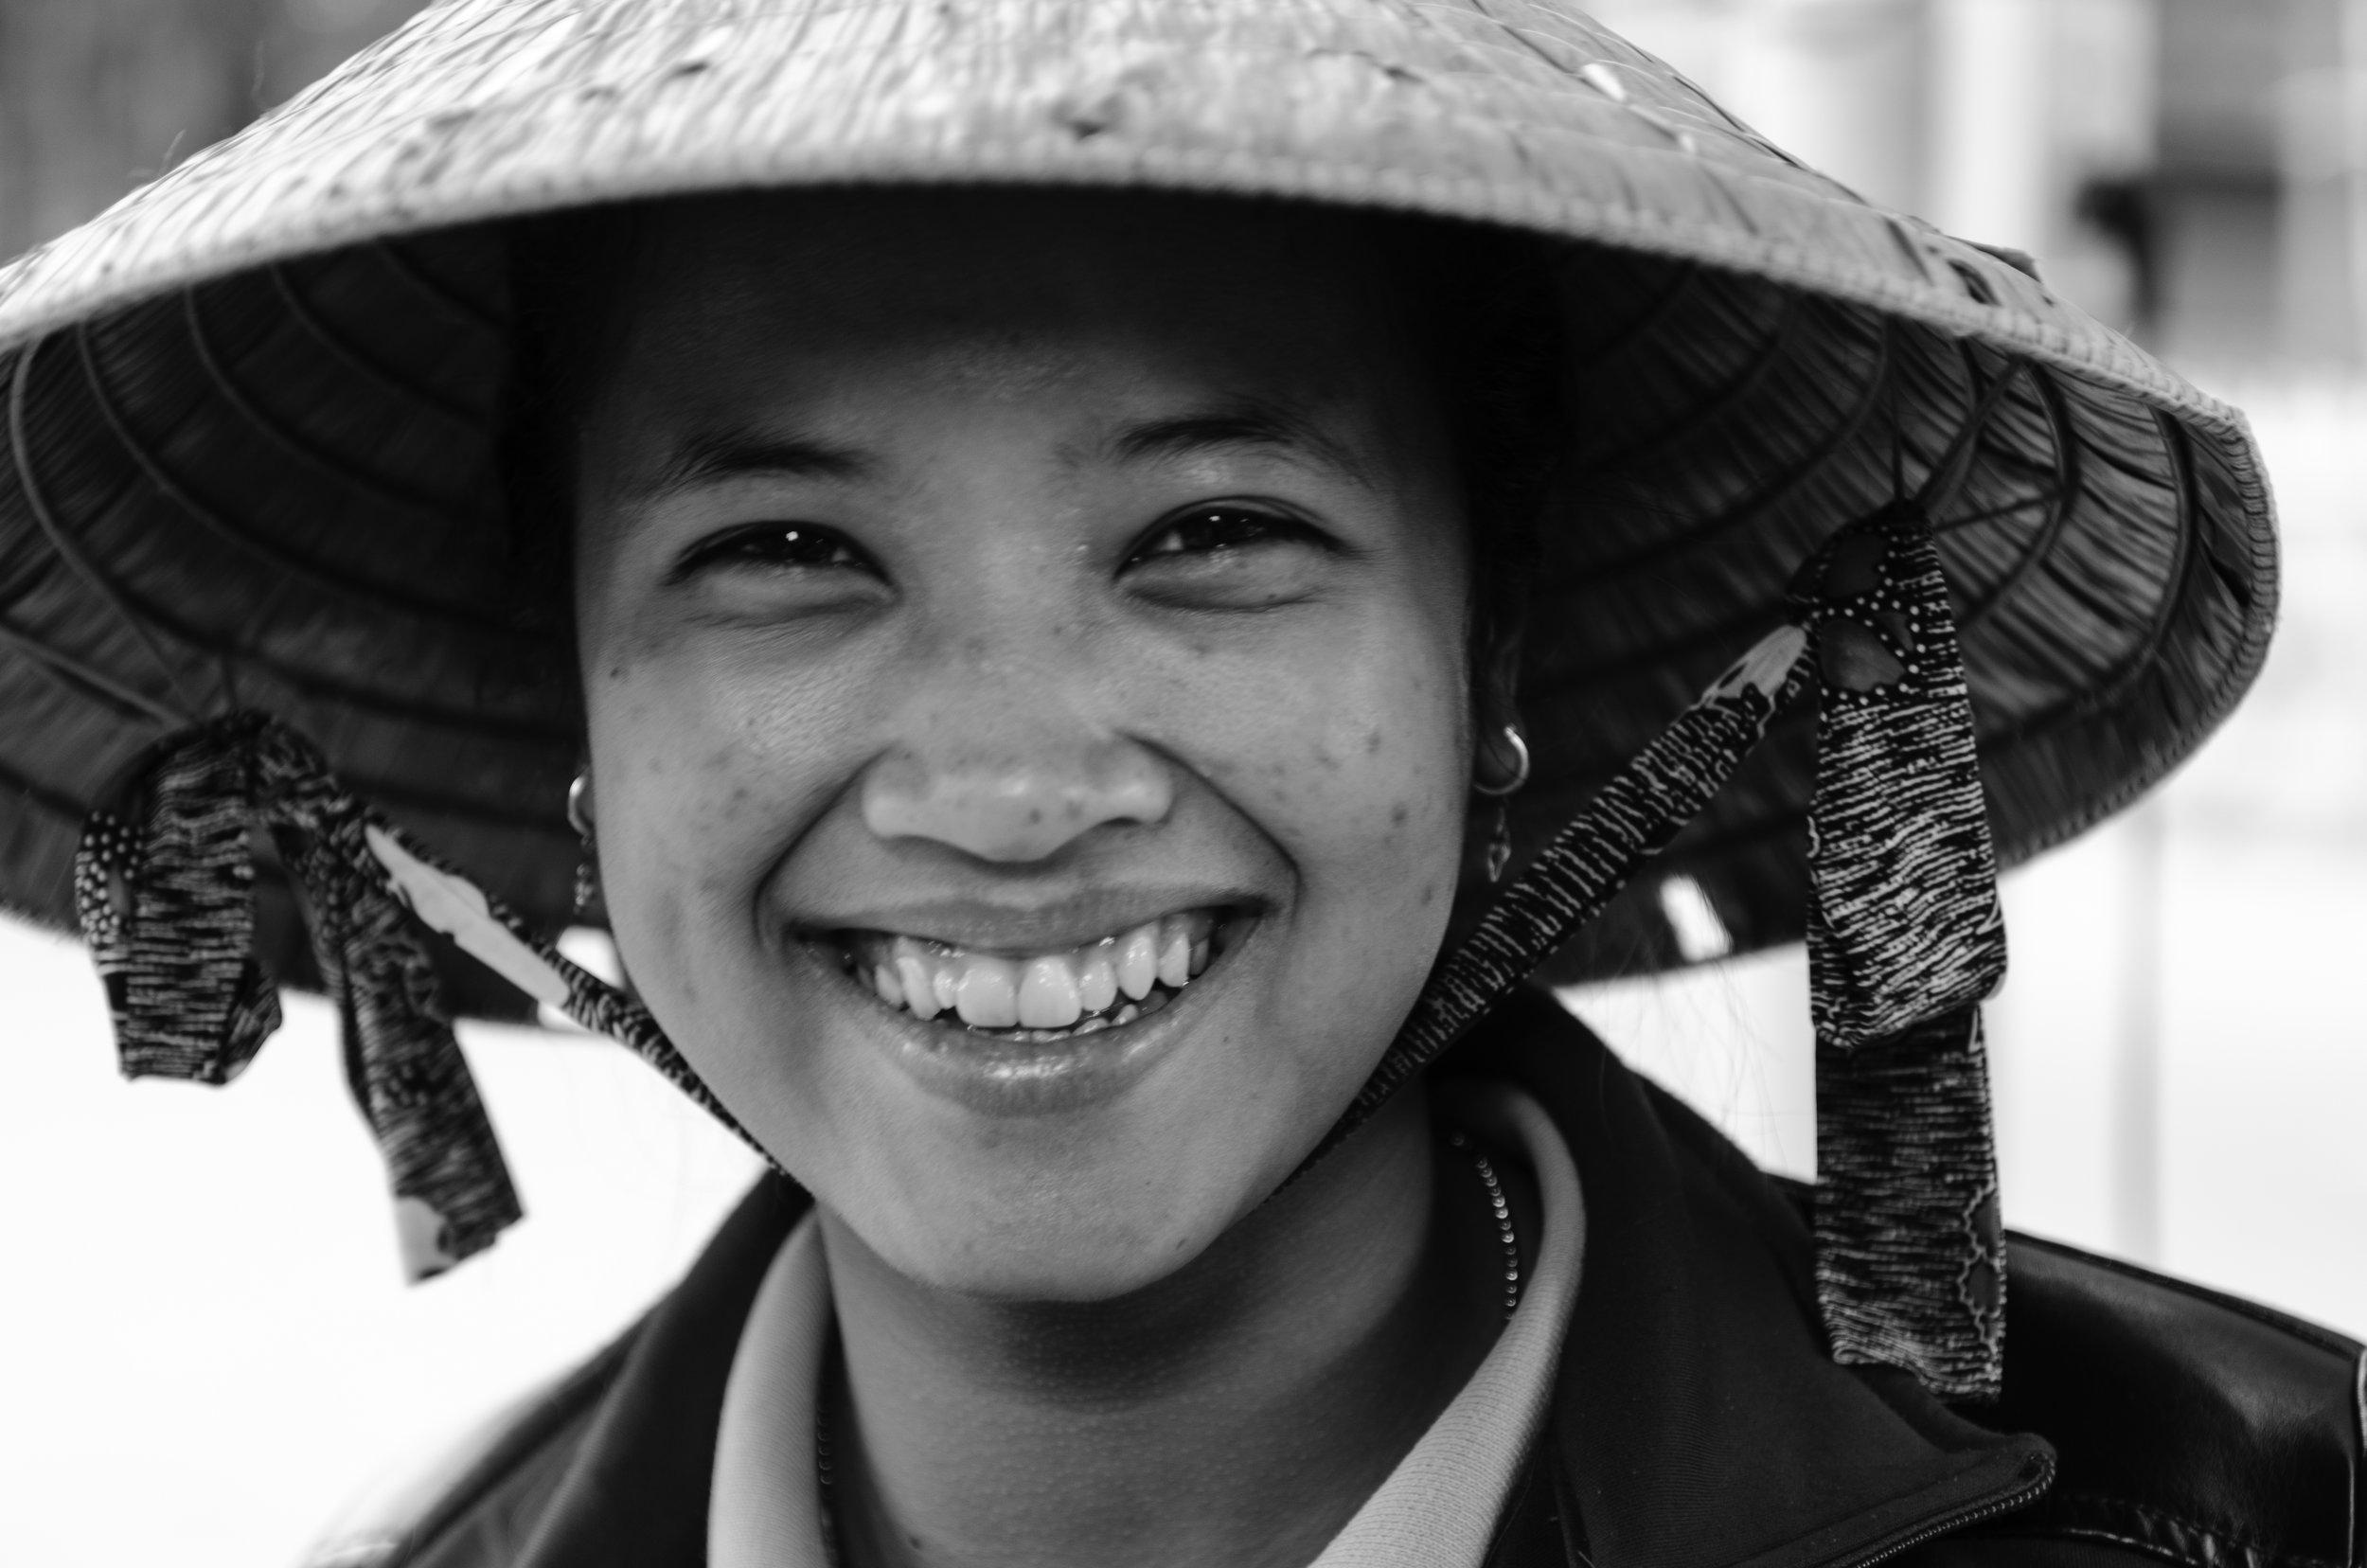 CiaoHo, Vietnamese's smile. Soctrang, Vietnam (27 Jan 2014).CC BY 2.0